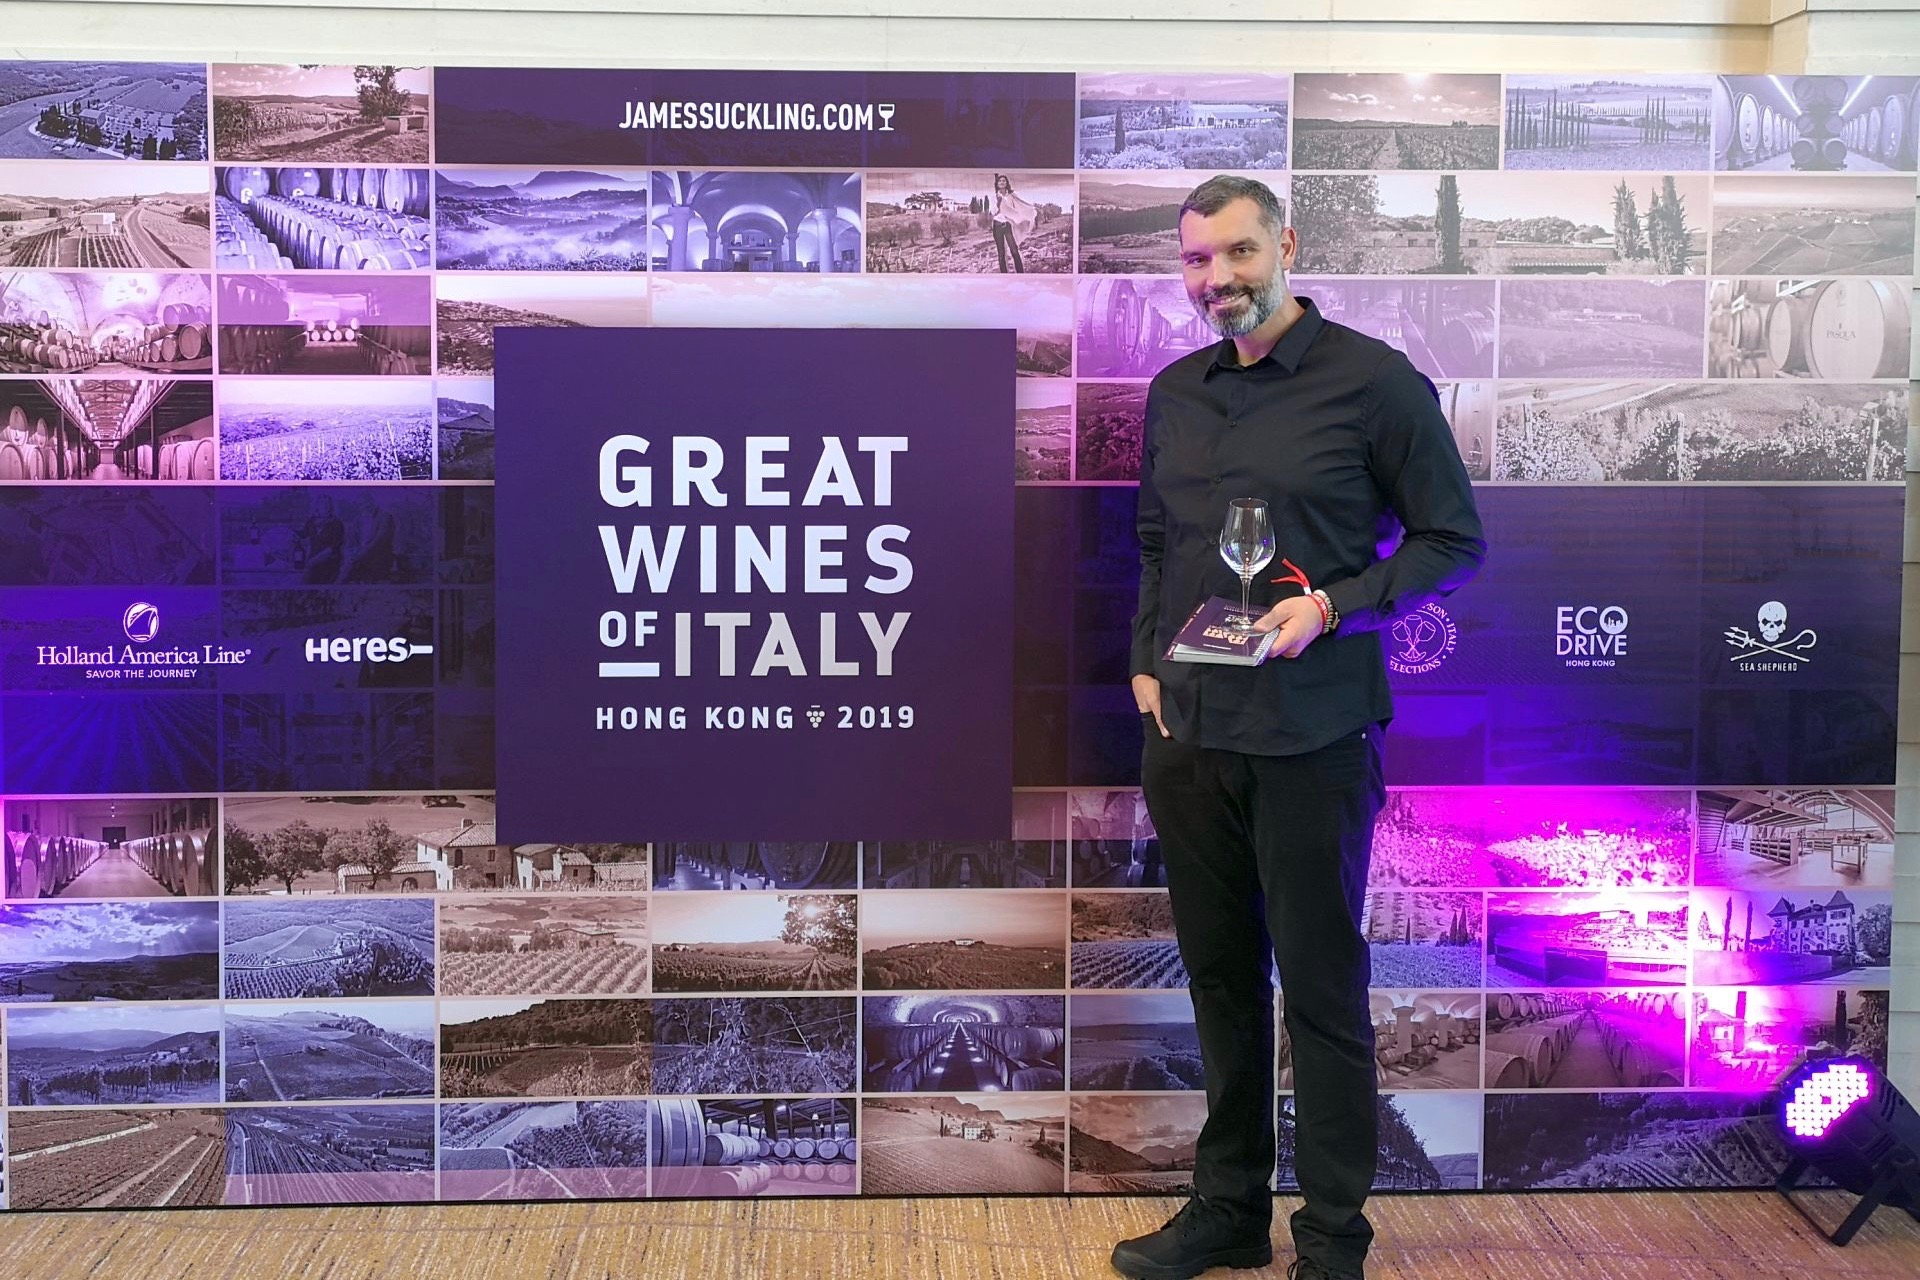 GREAT WINES OF ITALY by Božidar Jukić